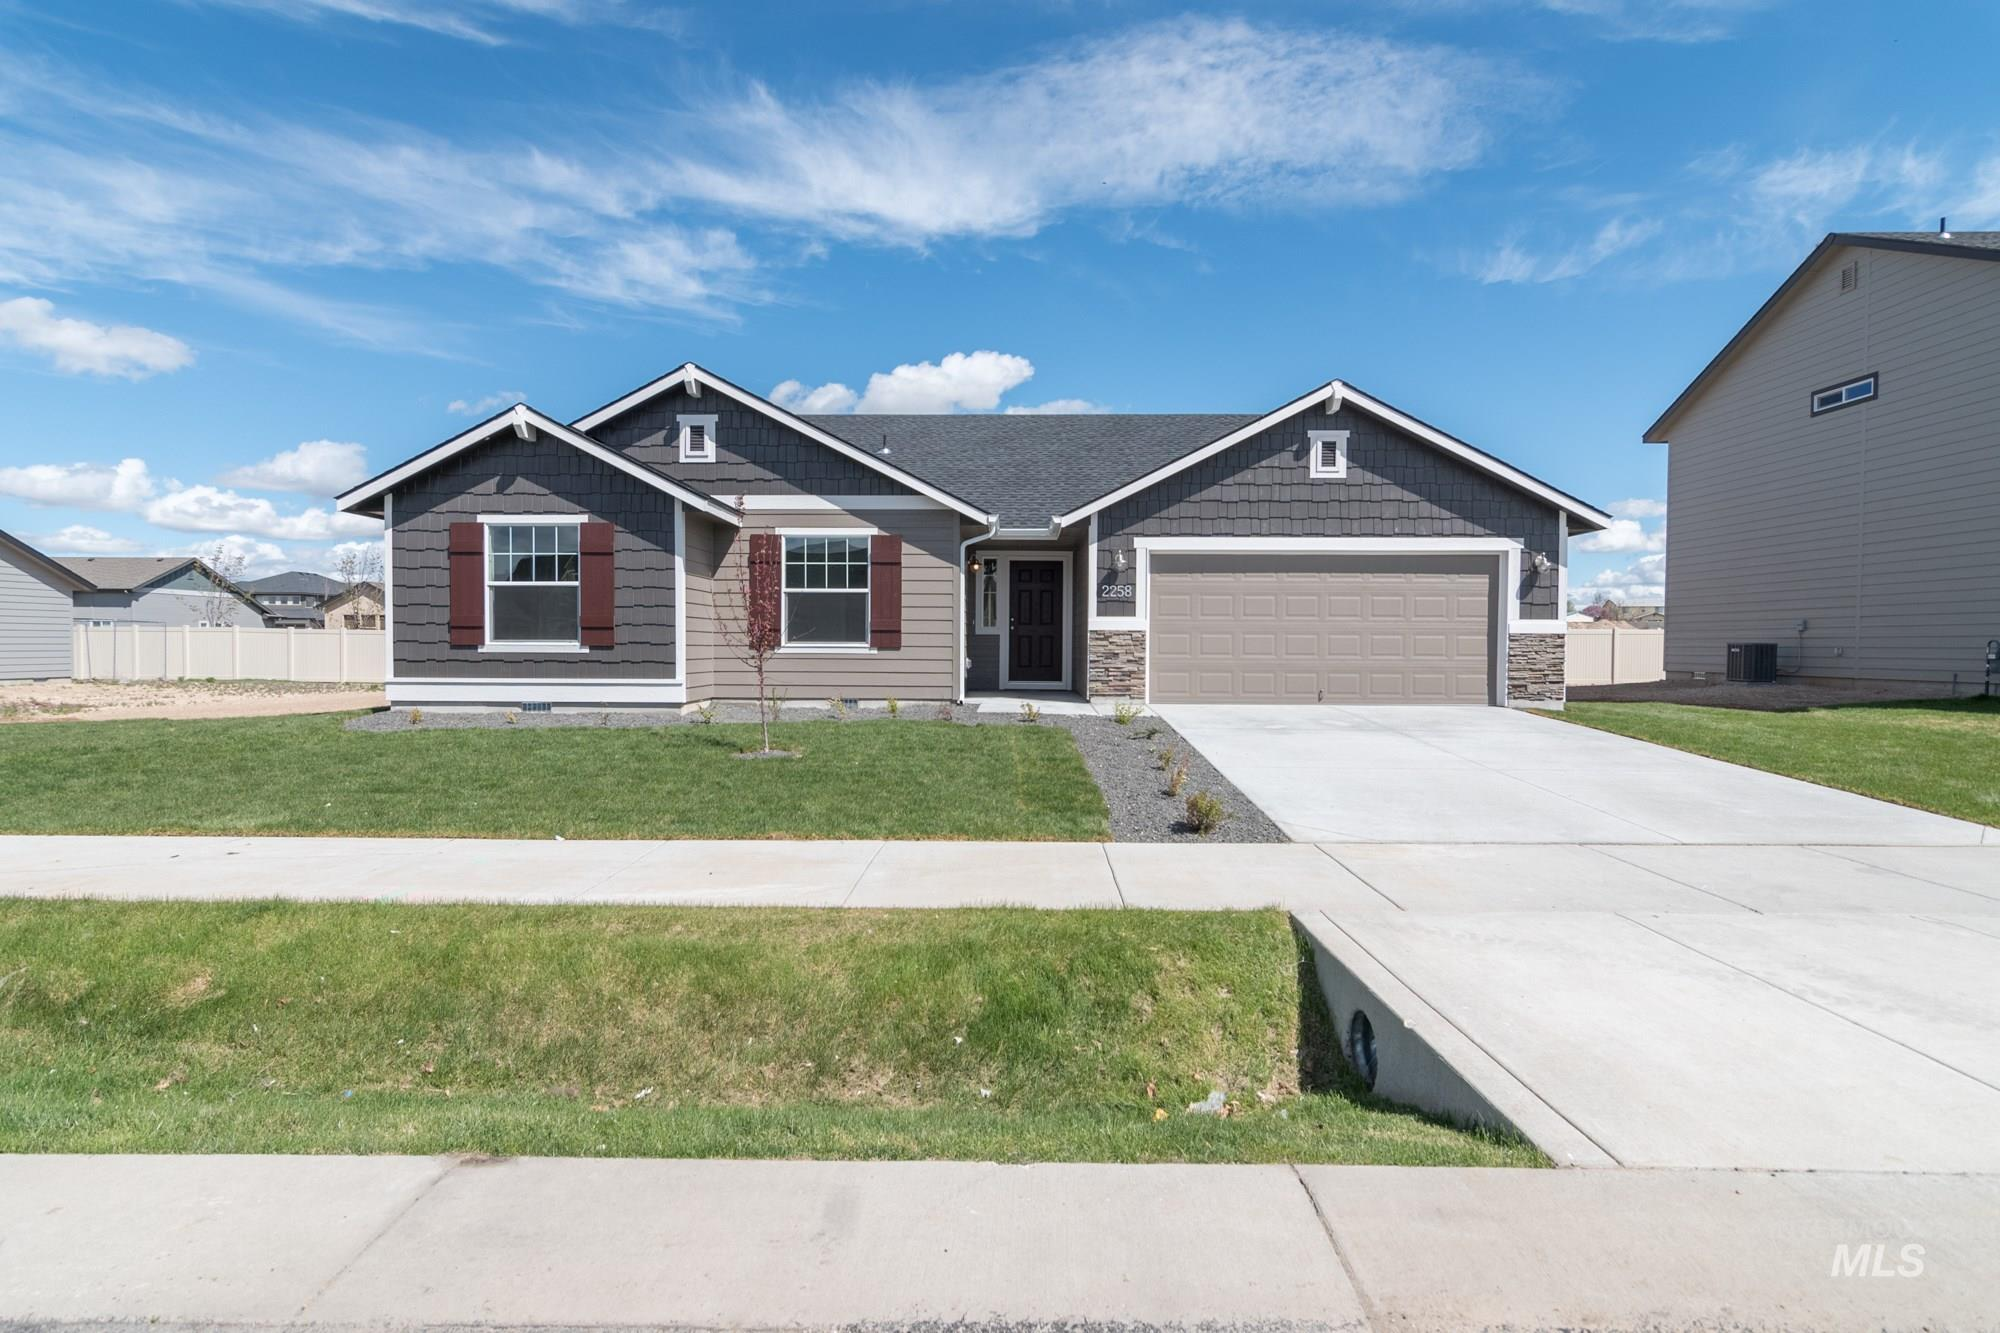 2810 N Iditarod Way Property Photo - Kuna, ID real estate listing